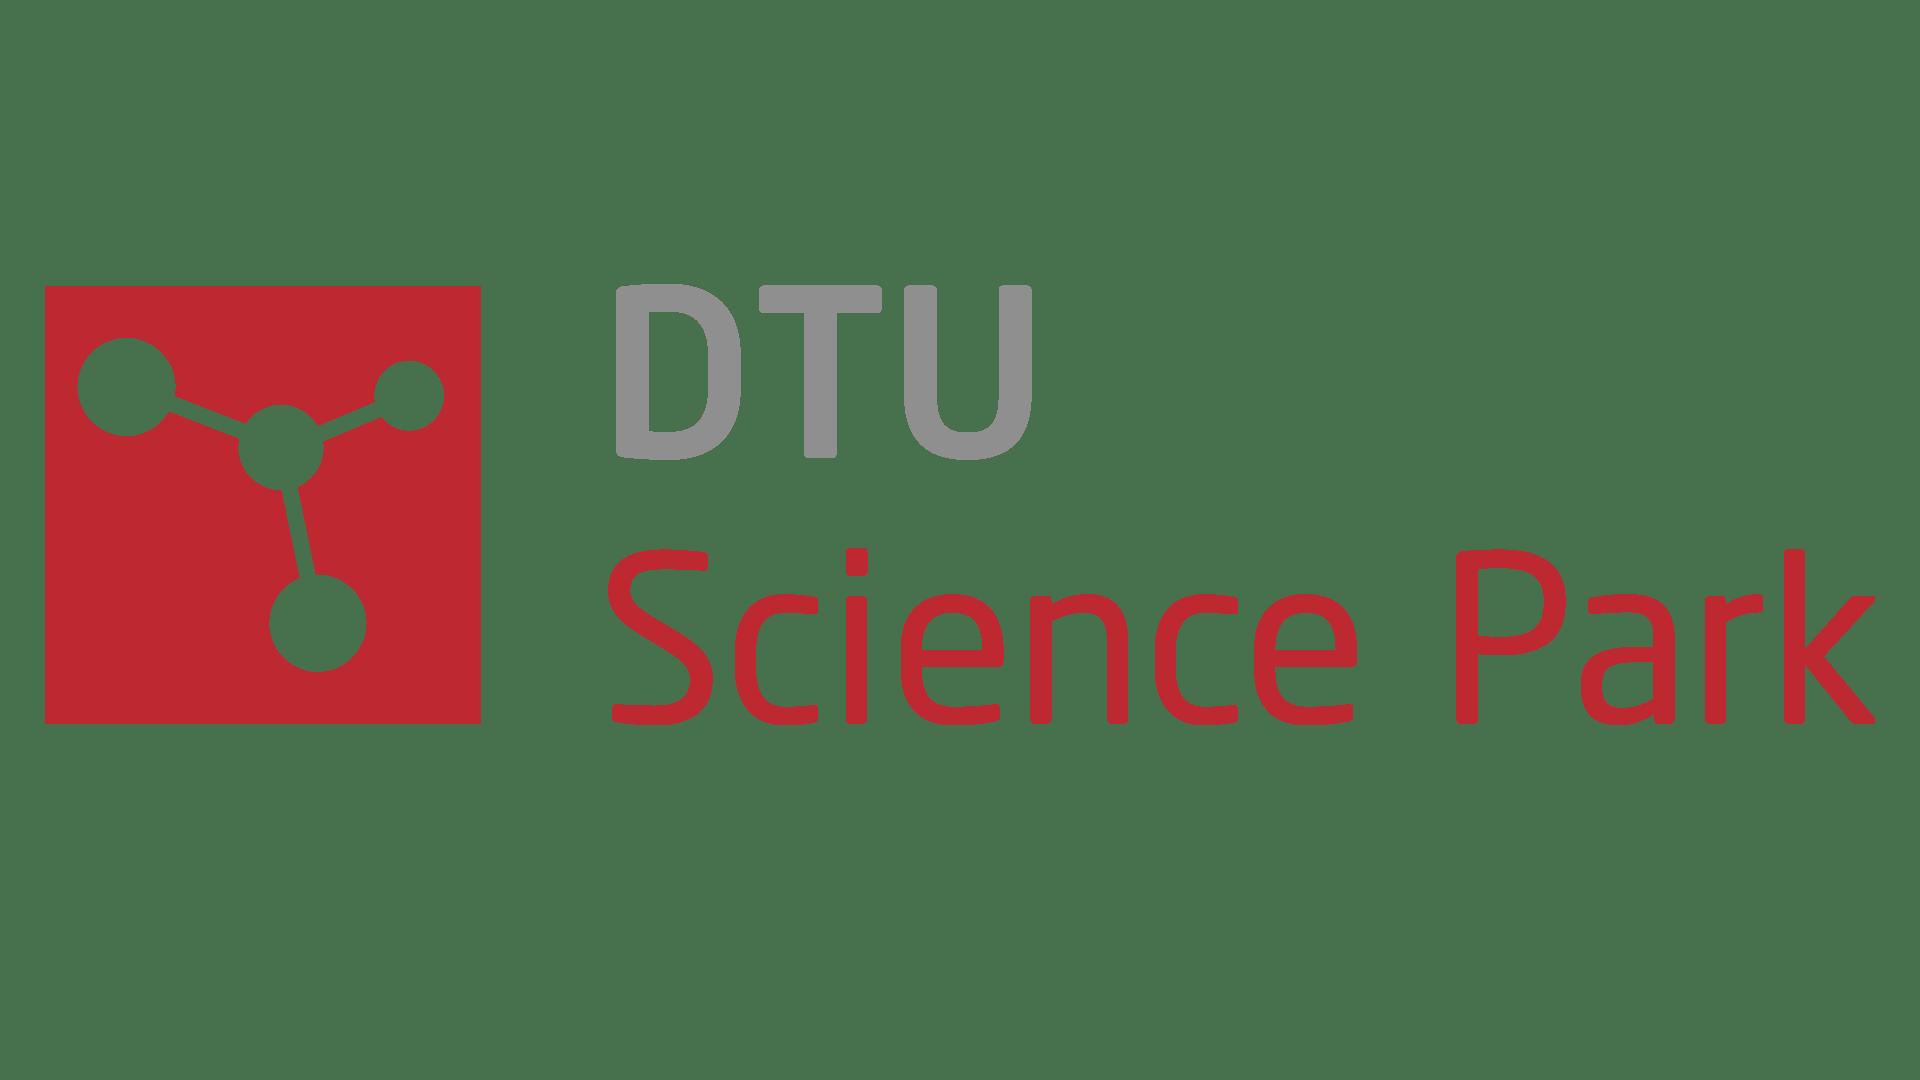 DTU-Science-Park_Large.png